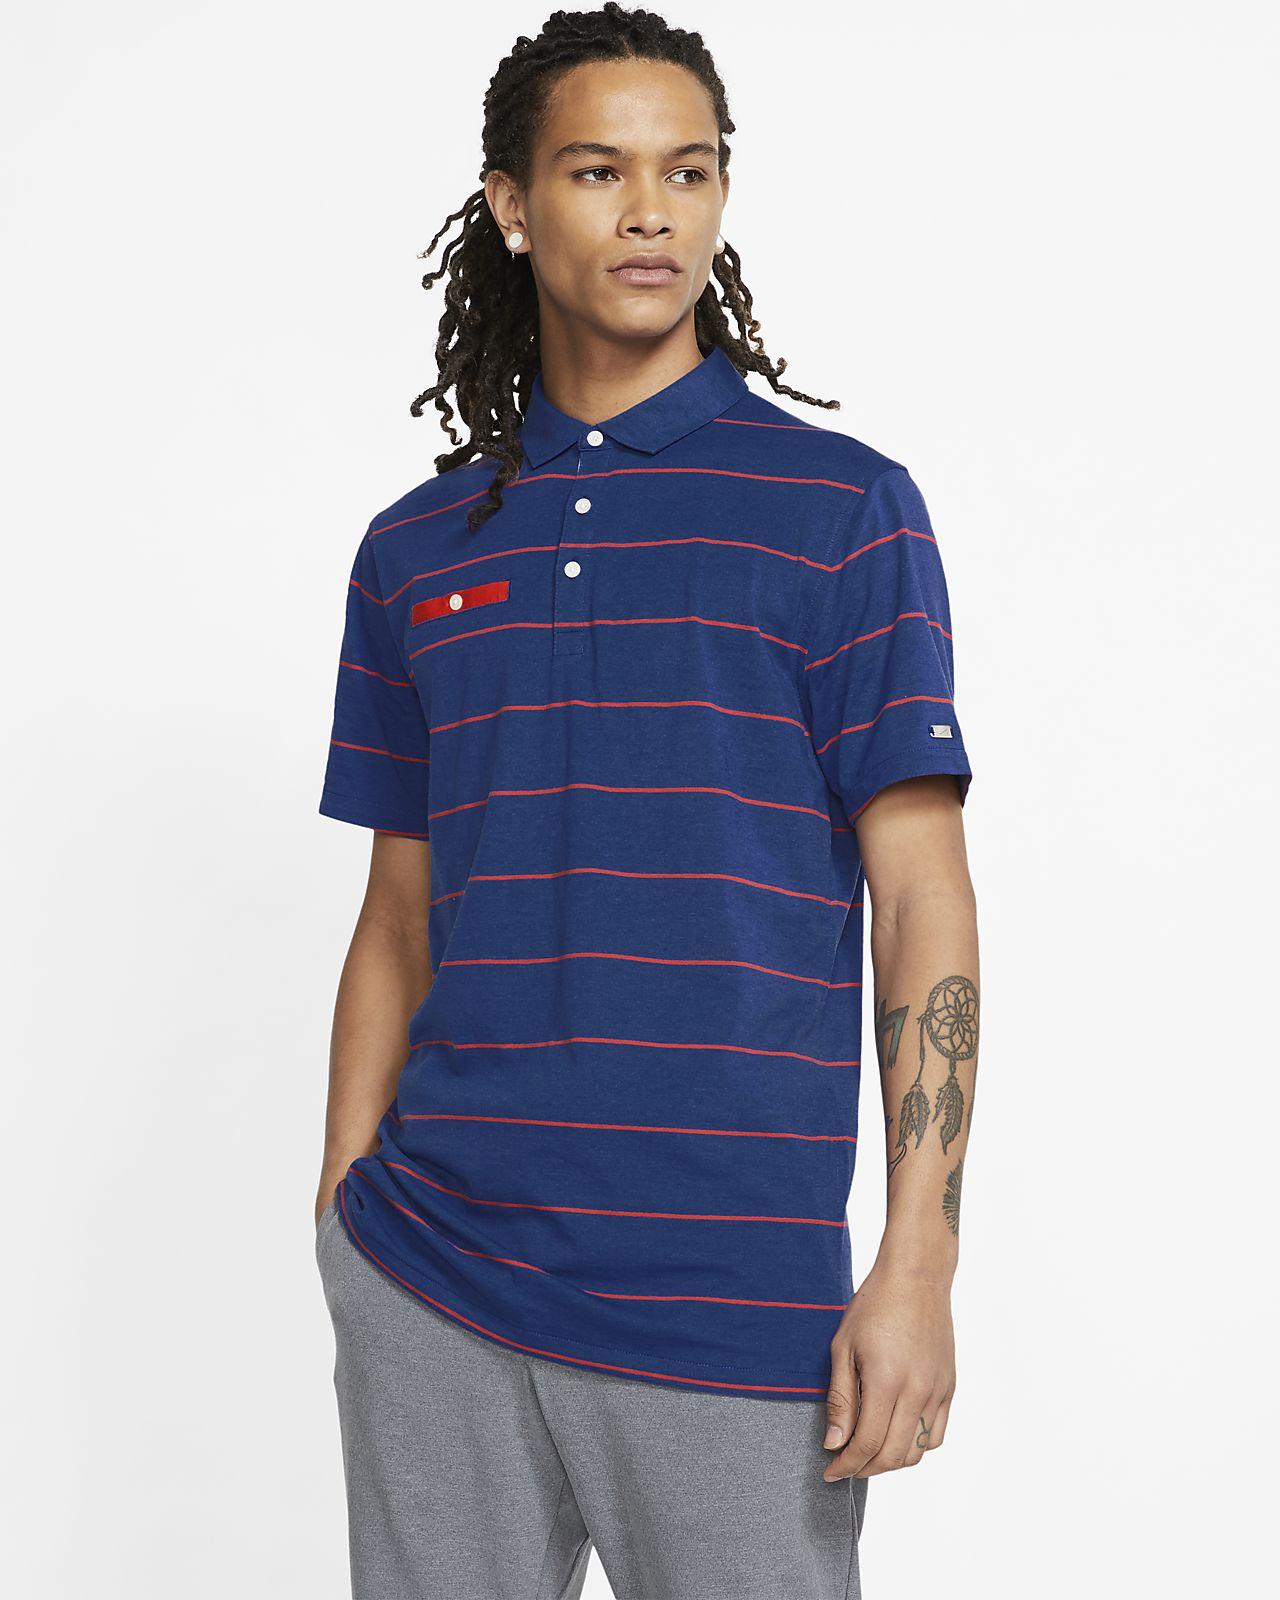 Nike Dri-FIT Player gestreiftes Herren-Golf-Poloshirt